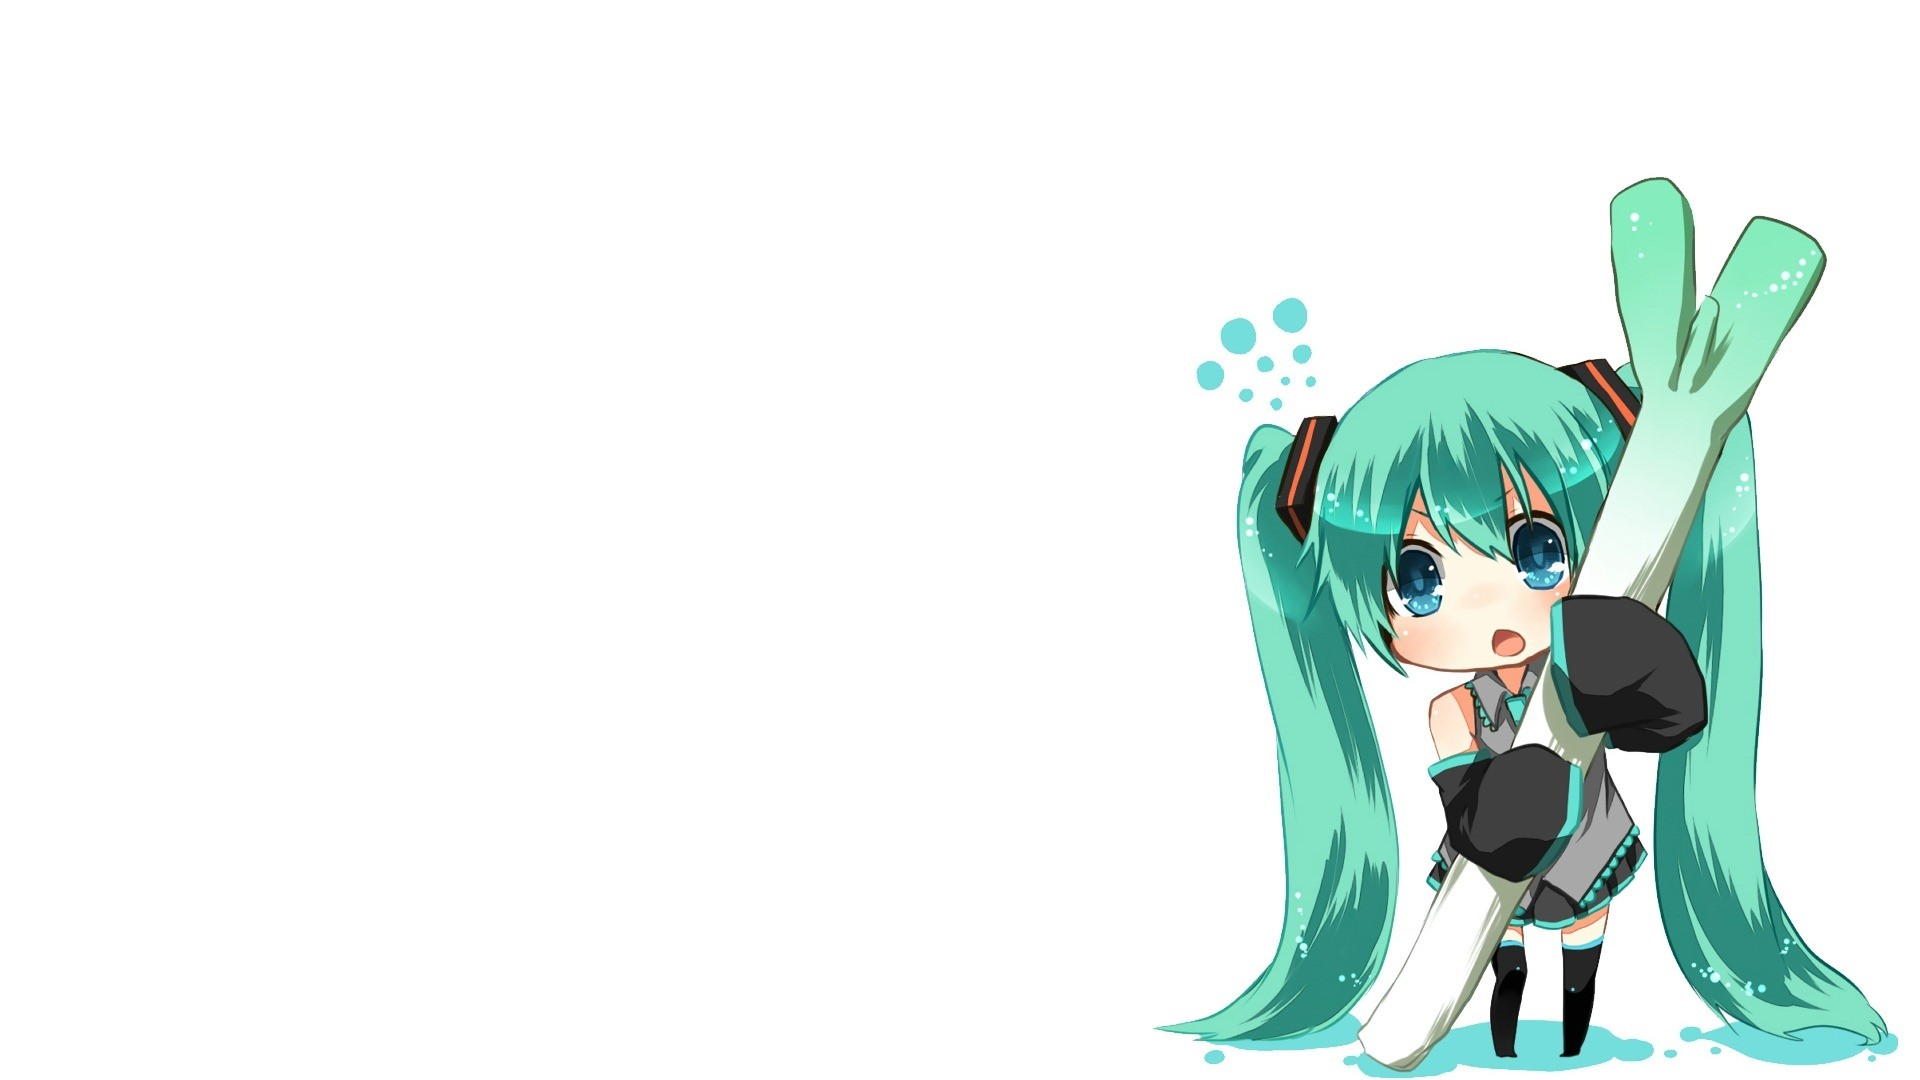 Chibi Anime Girl Wallpaper